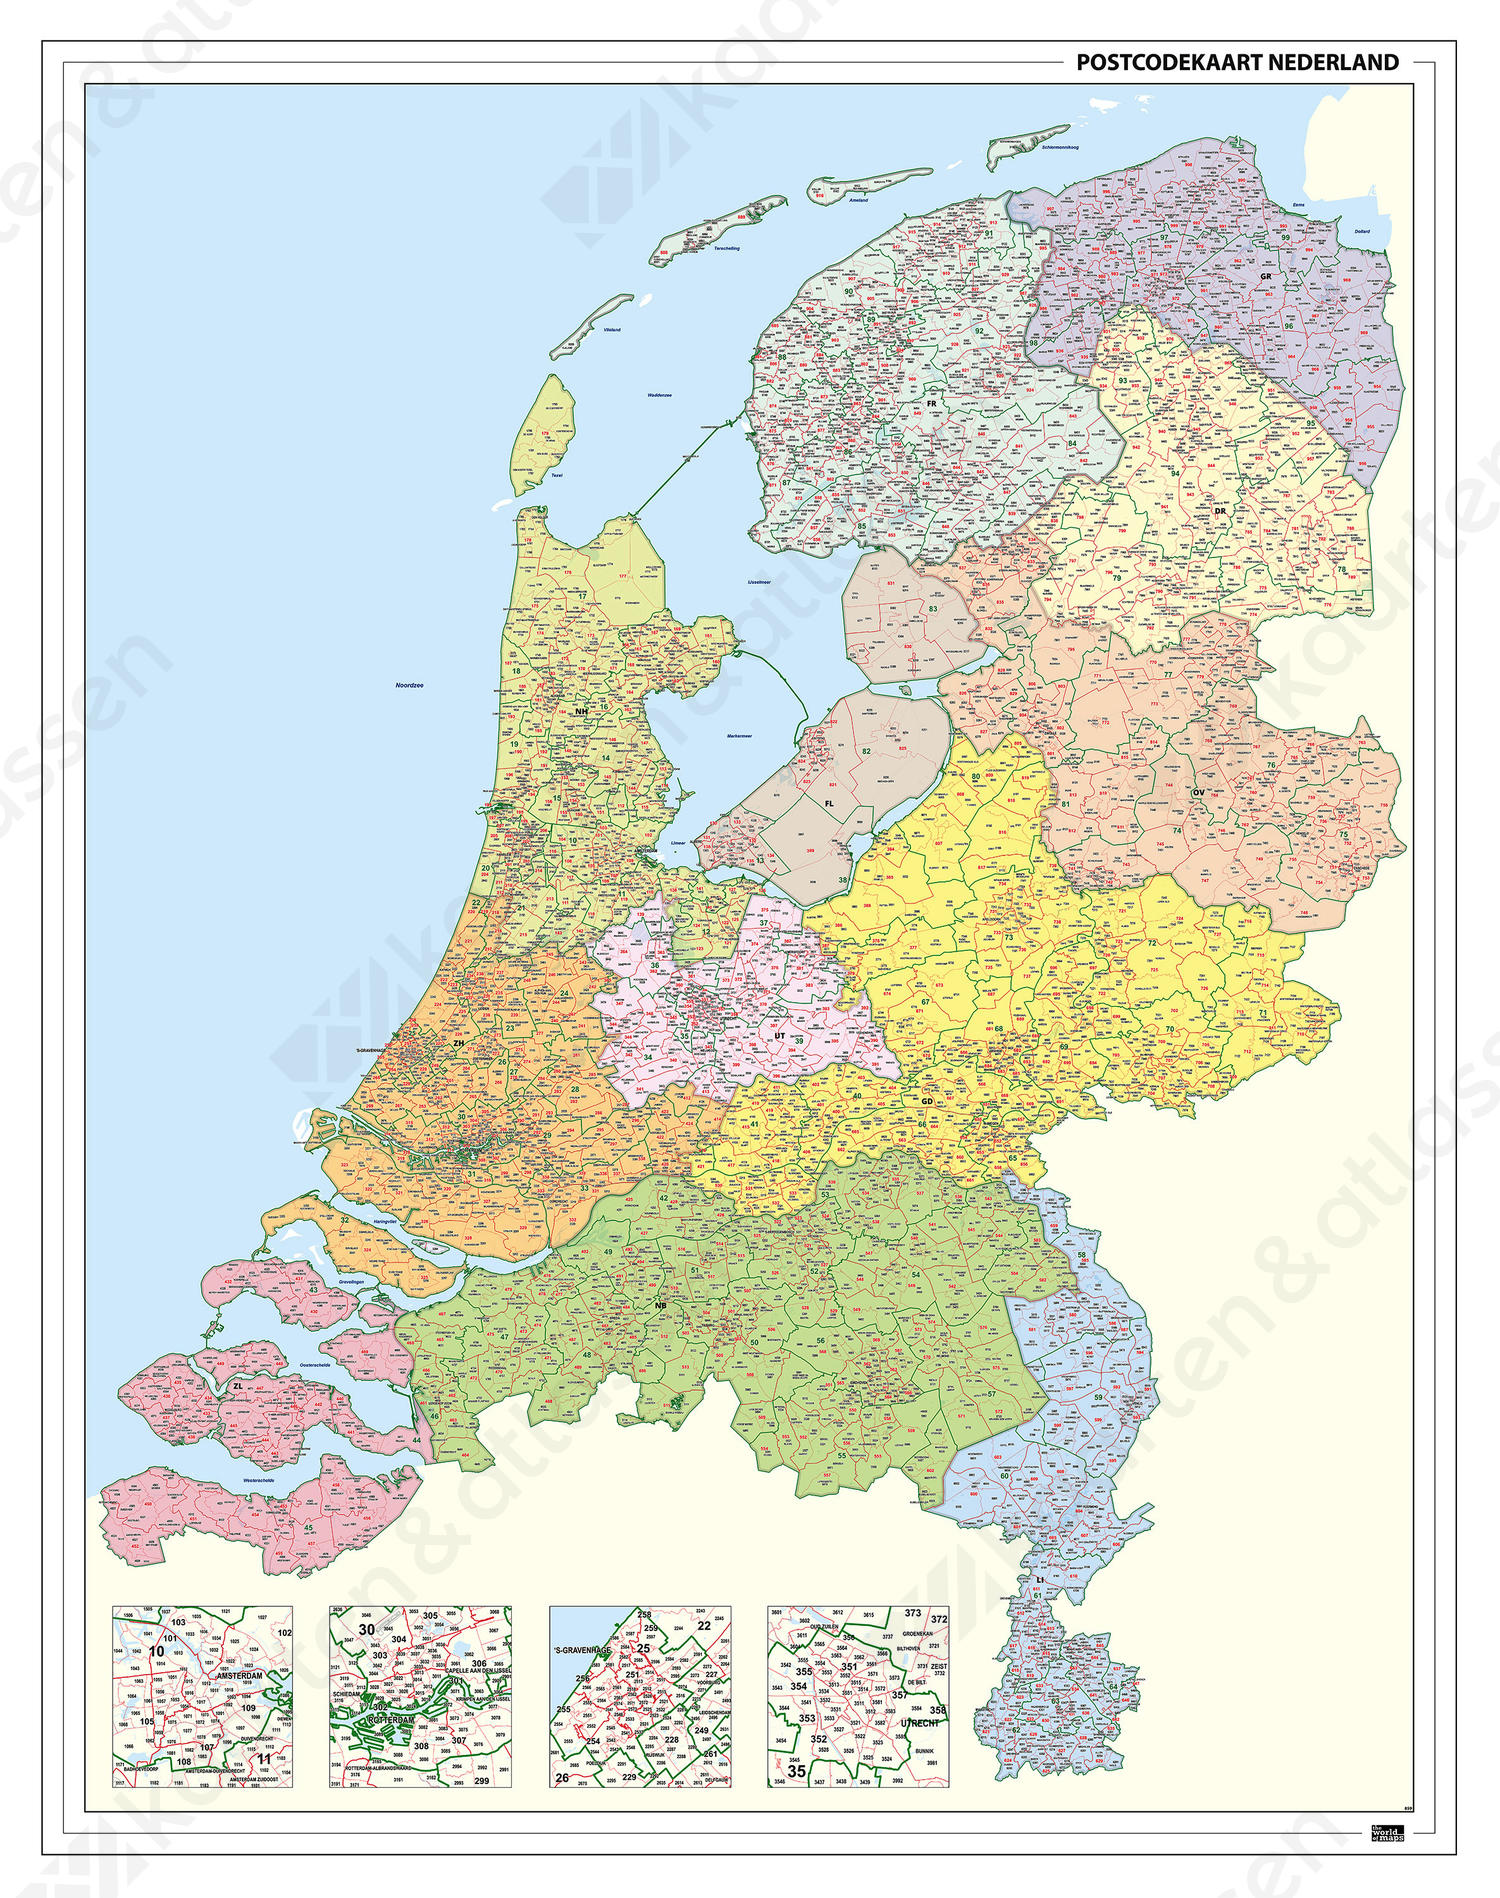 Postcodekaart Nederland 2-3-4- cijferig 1394